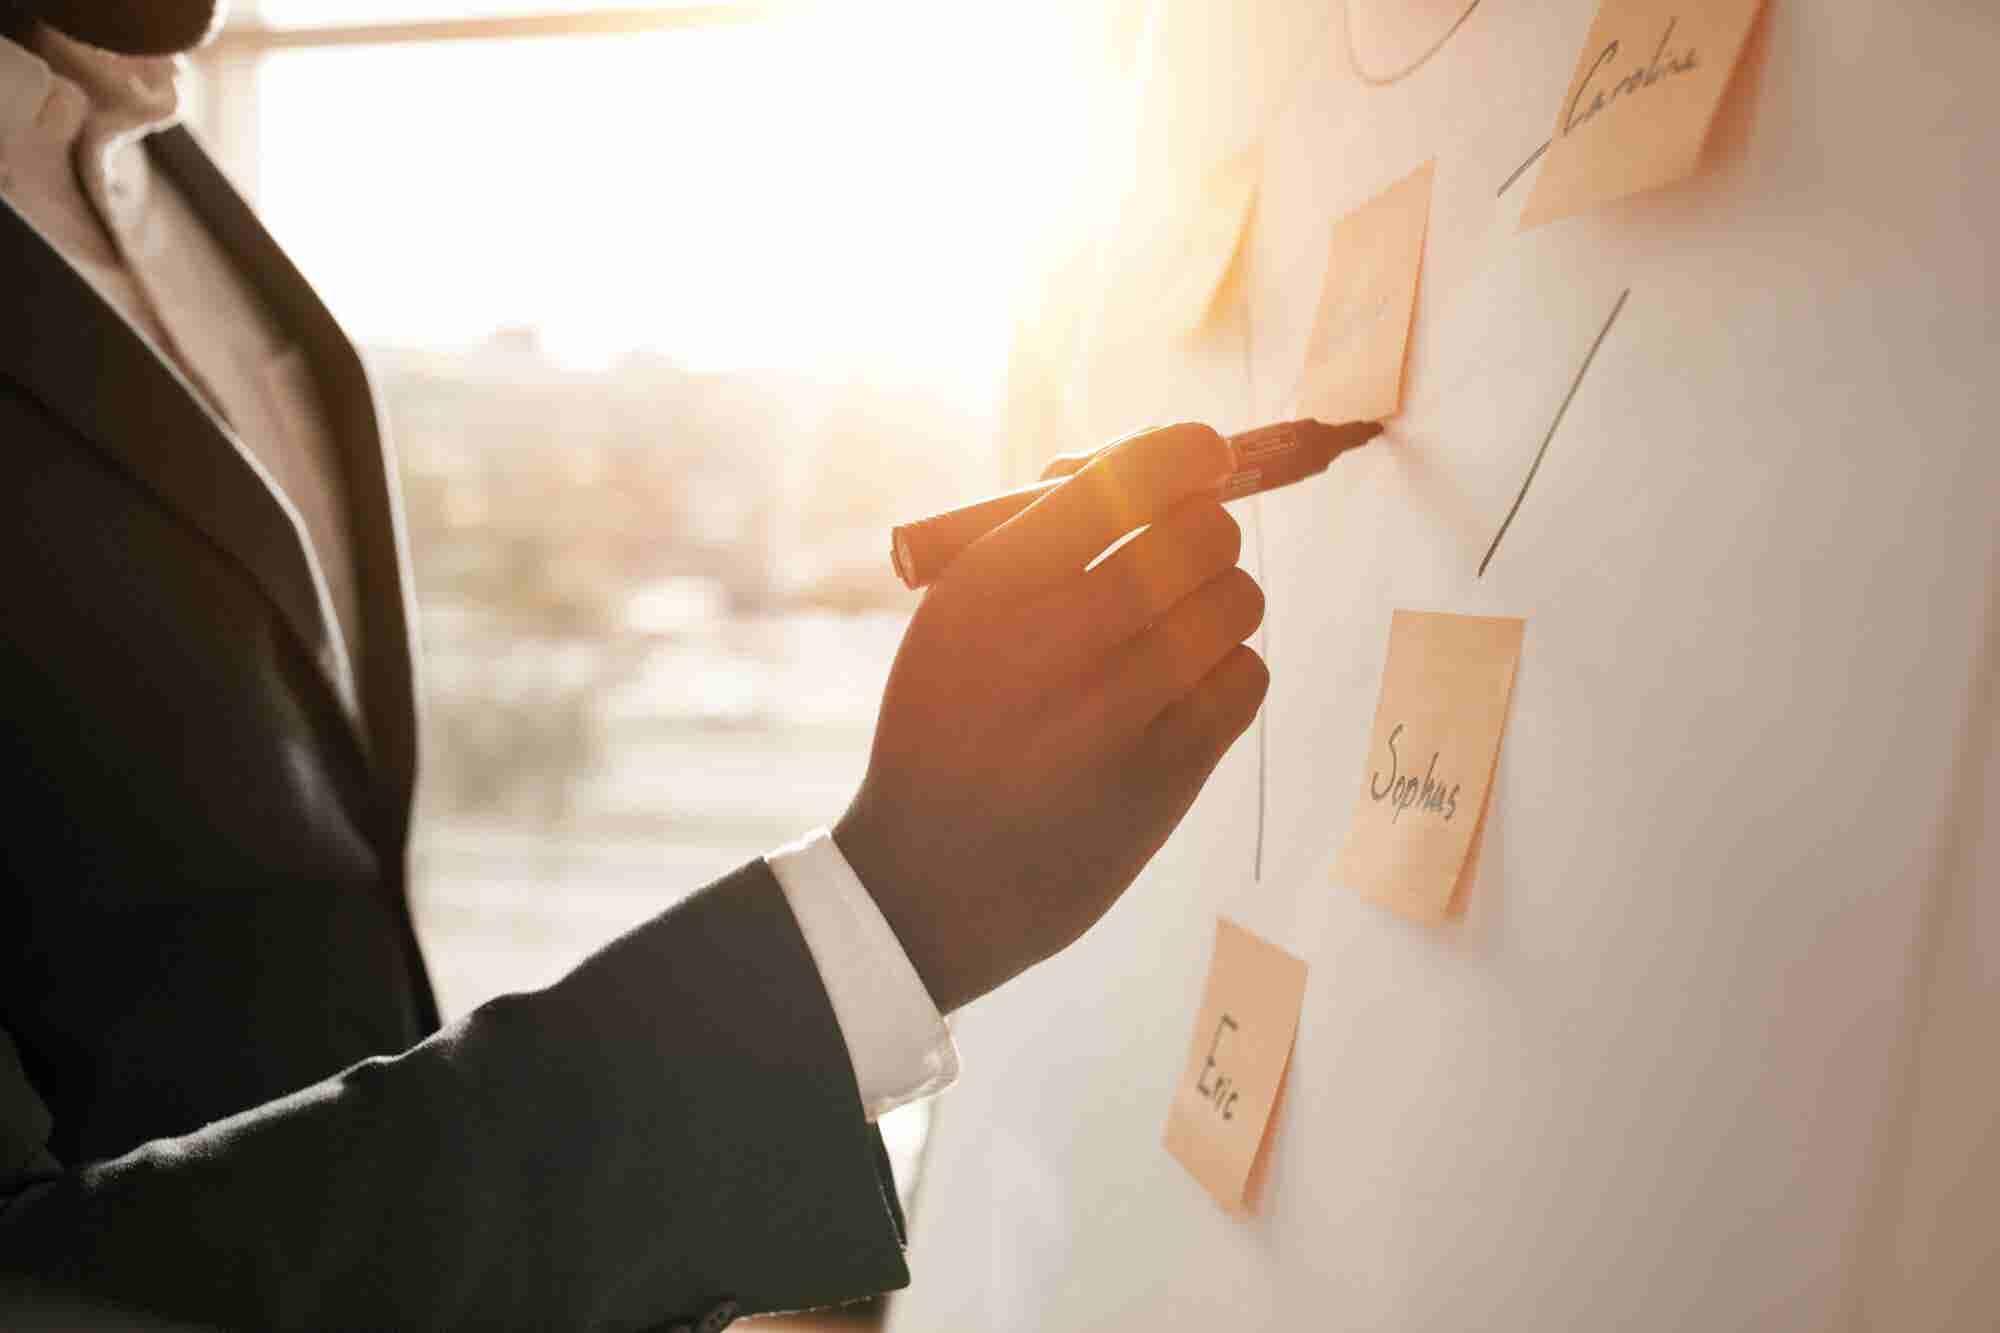 Sustaining Your Enterprise's Vision